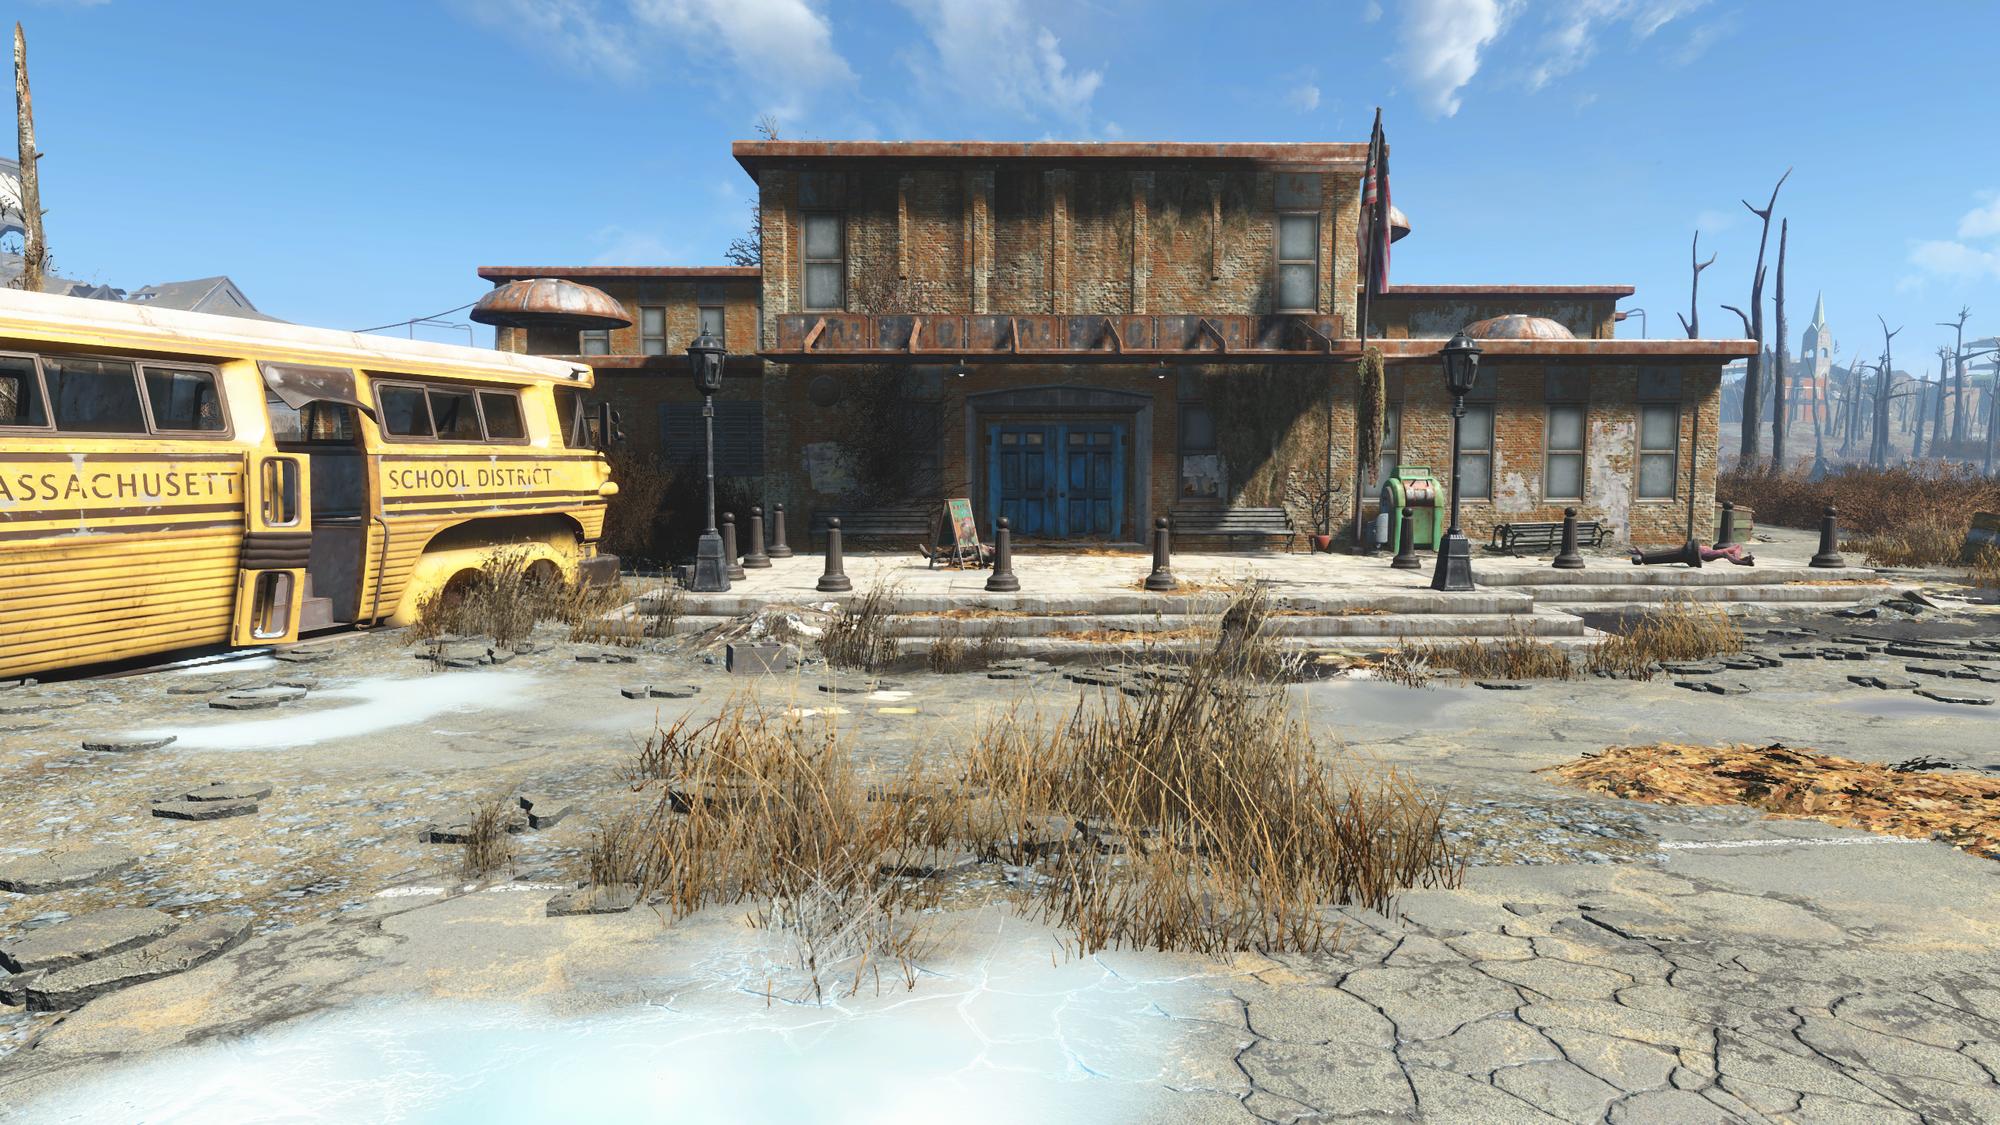 Suffolk County charter school | Fallout Wiki | FANDOM